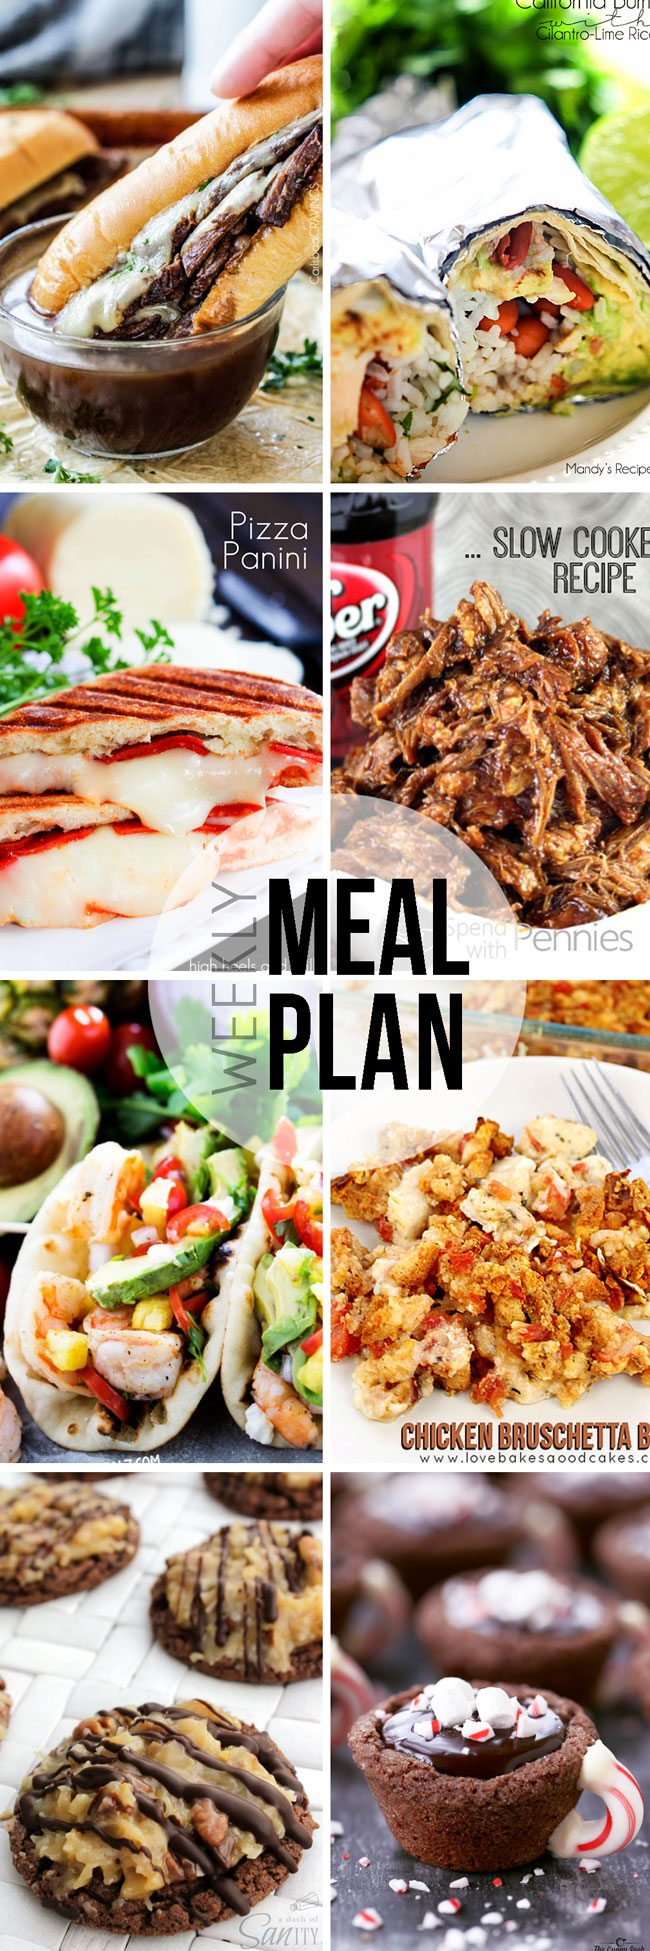 Meal-Plan---Pinterest-26